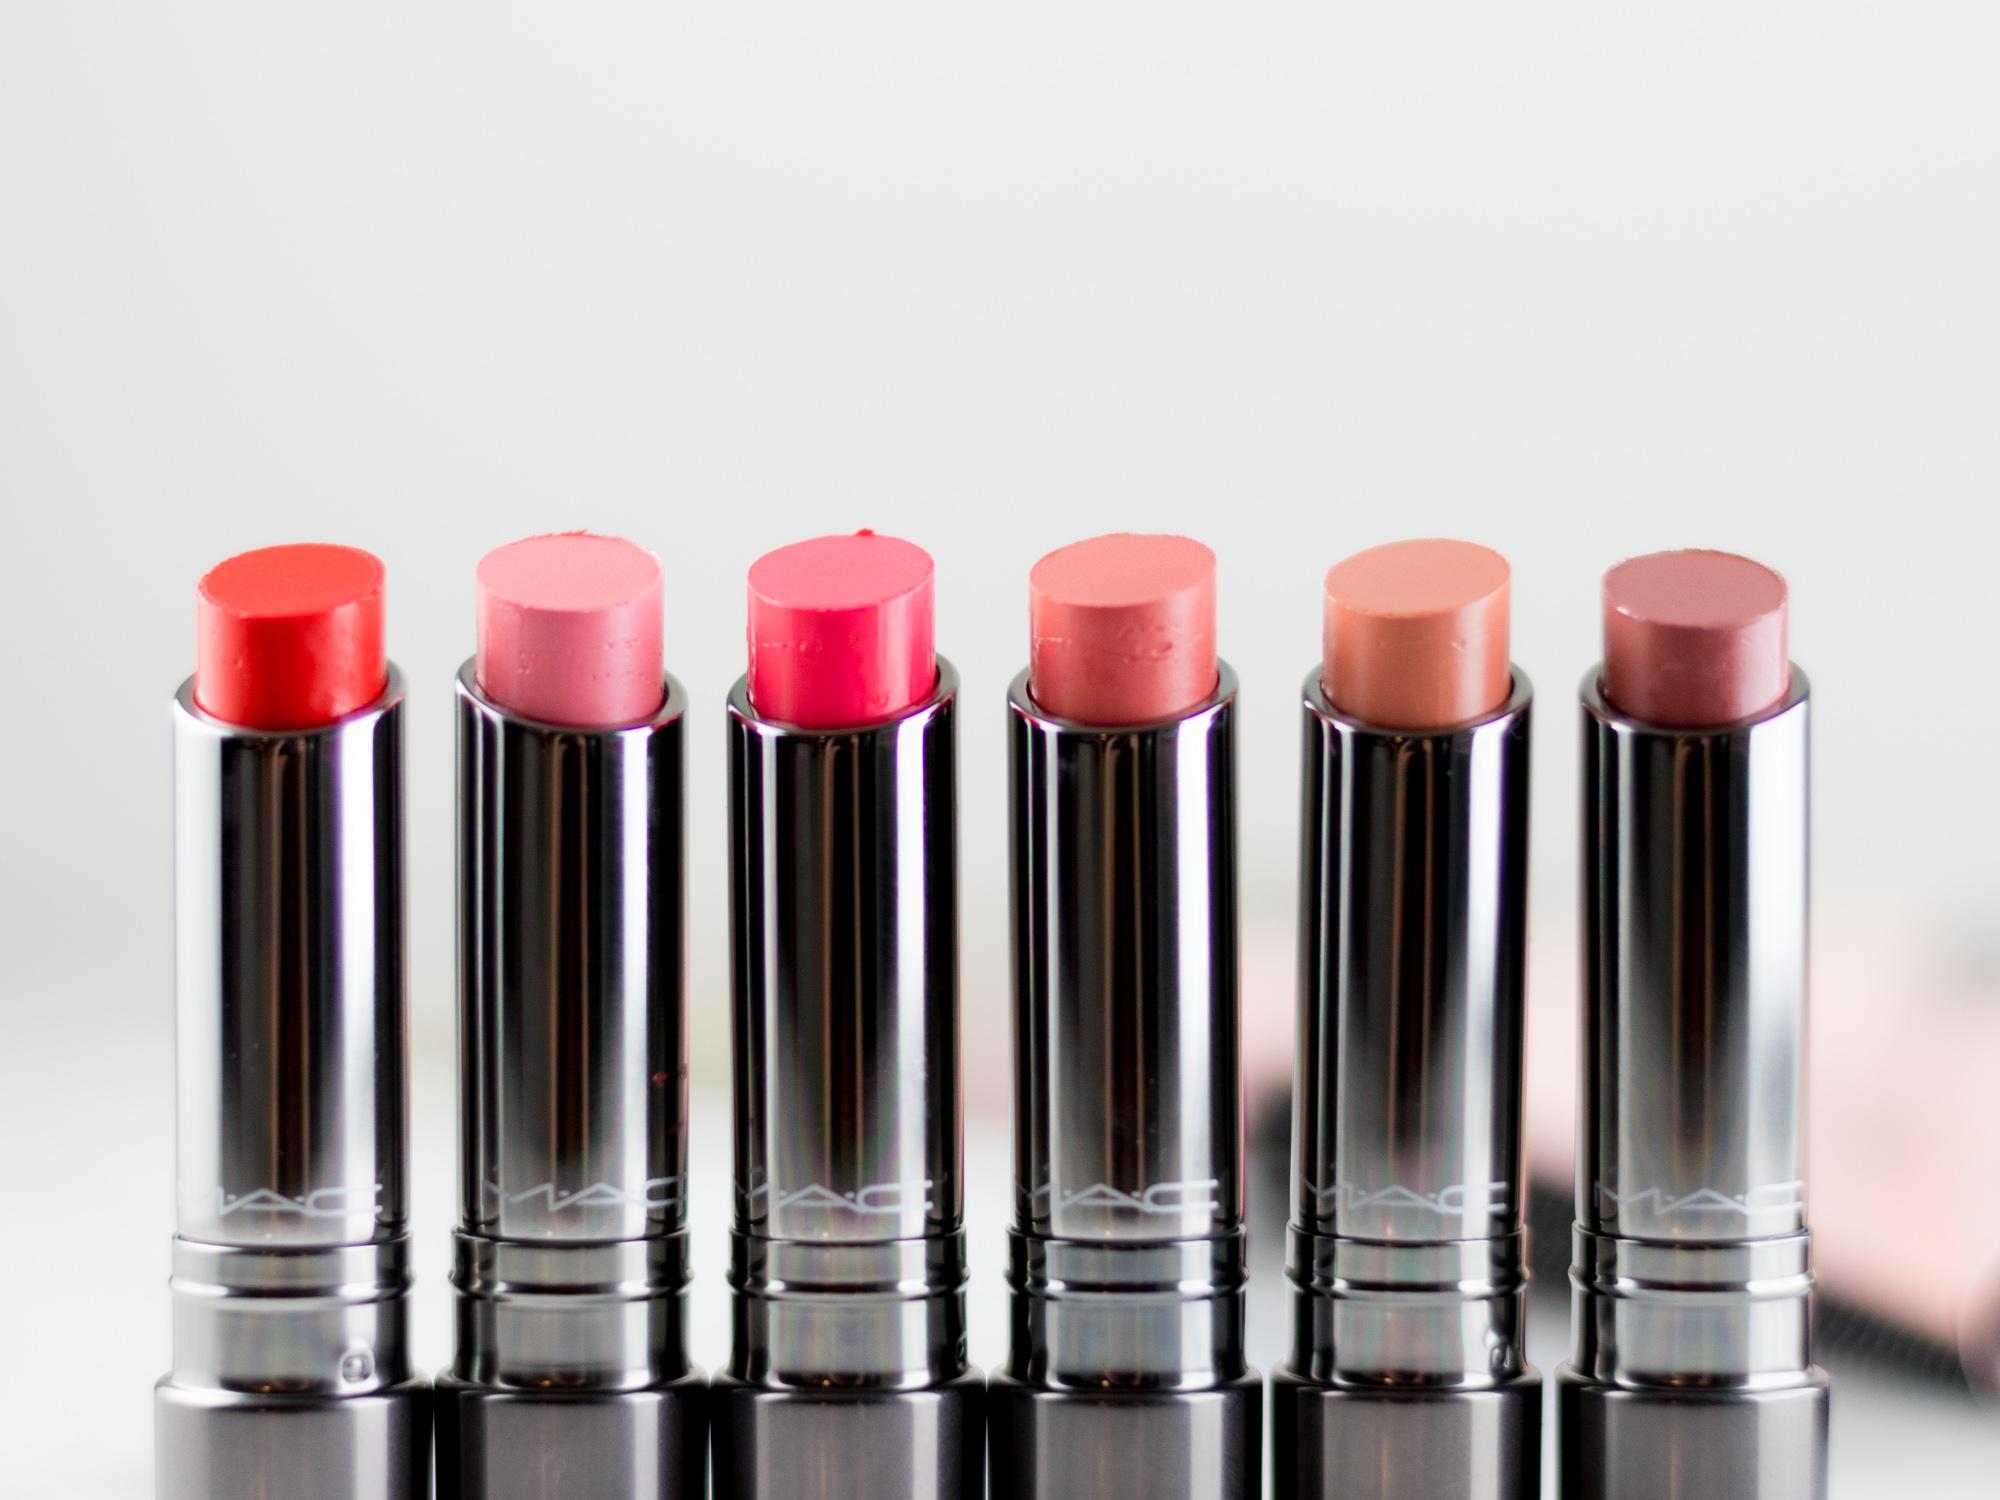 MAC Plenty of Pout Plumping Lipstick